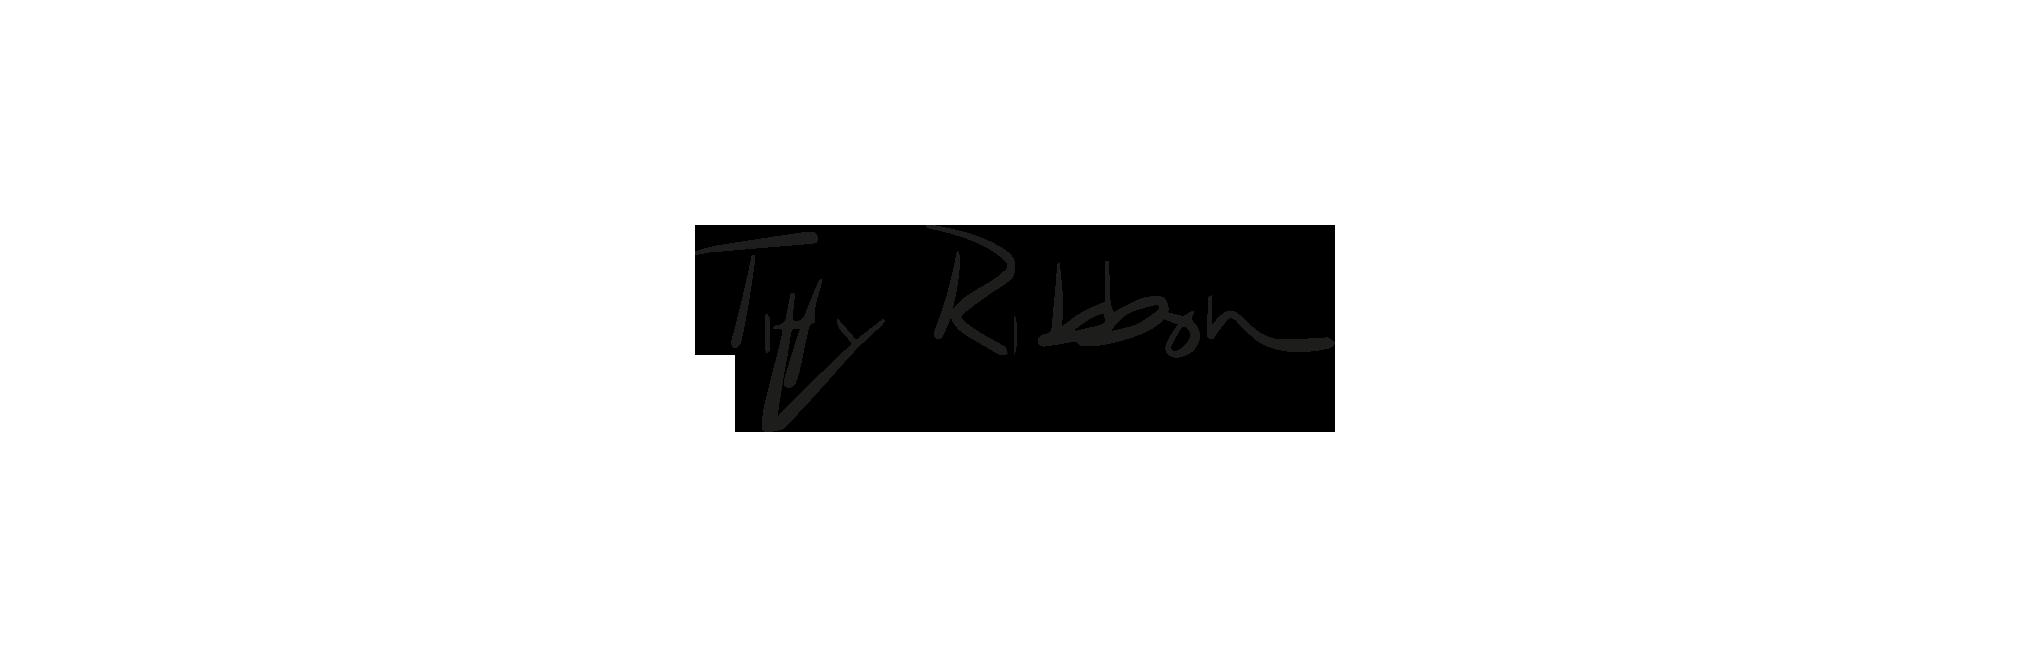 Tiffy Ribbon